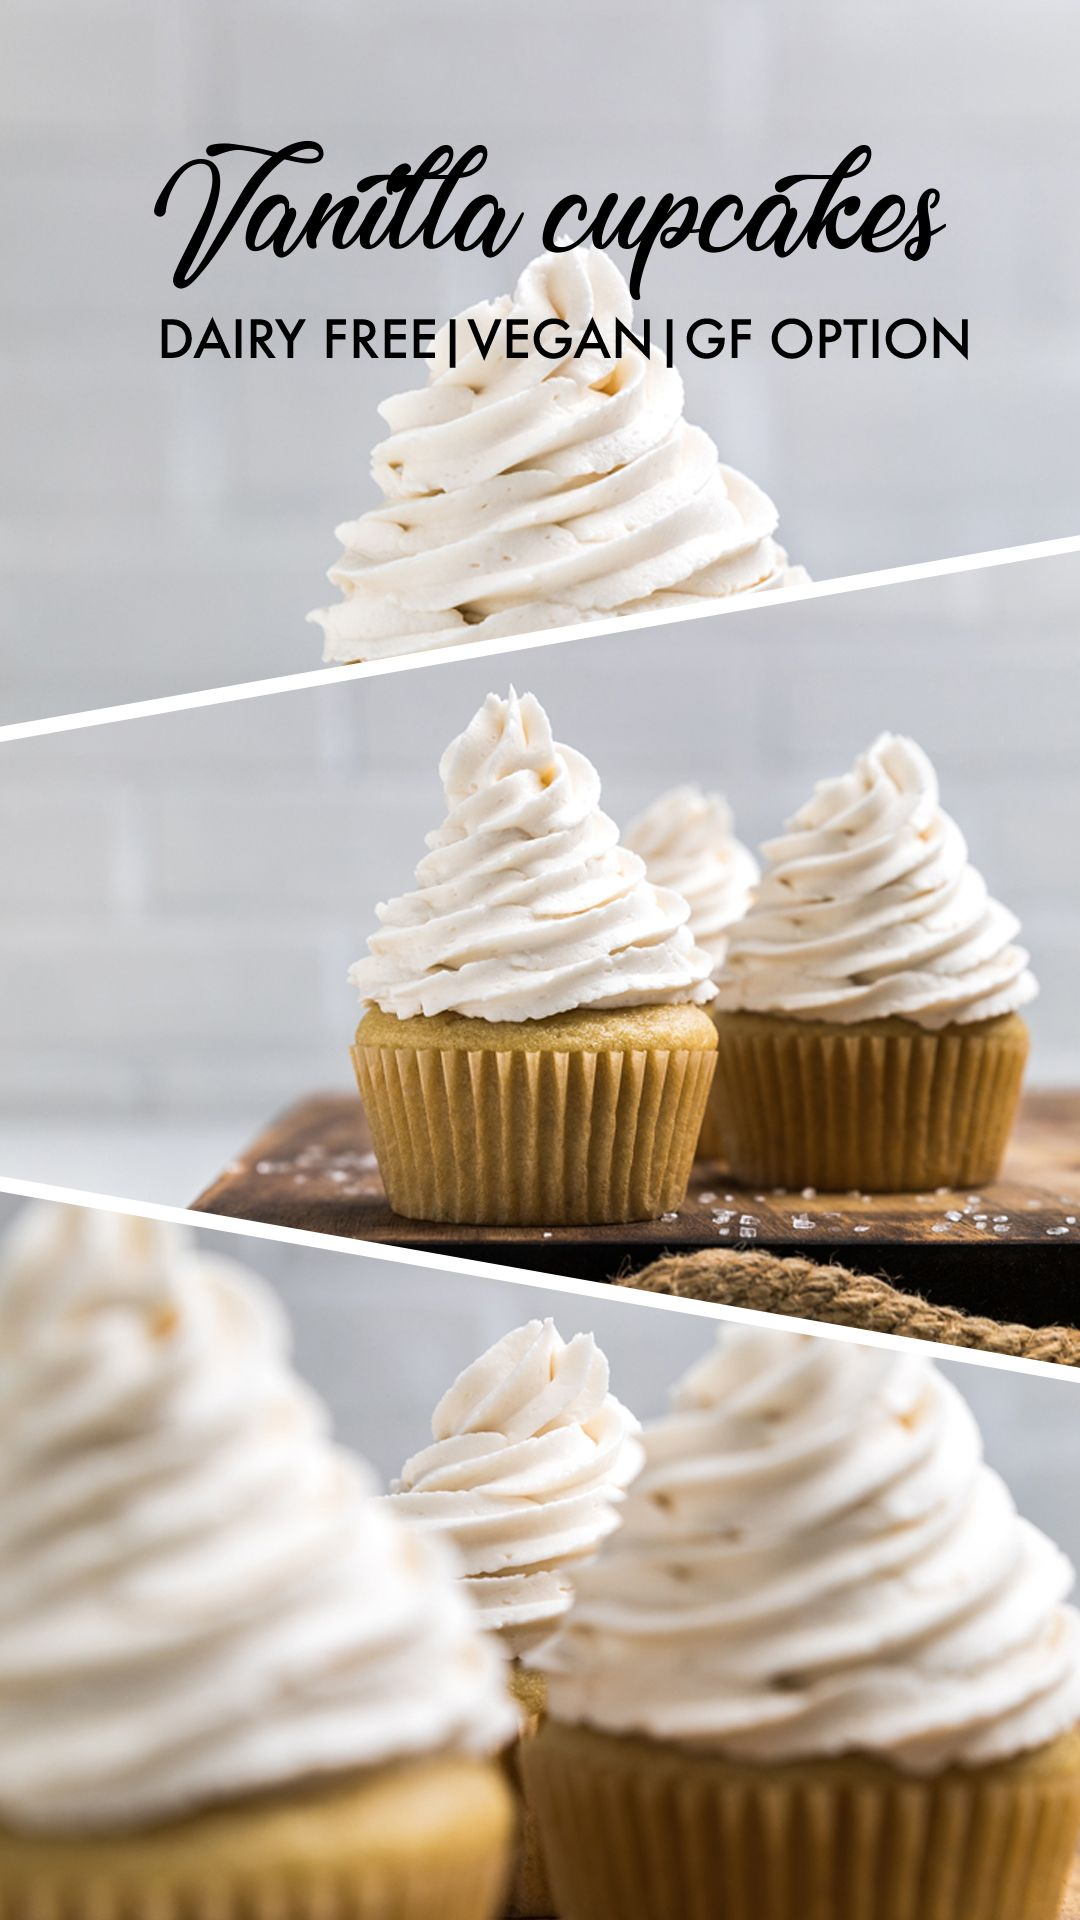 Dairy Free Vanilla Cupcakes Vegan Make It Dairy Free Dairy Free Cupcakes Dairy Free Vanilla Cake Dairy Free Cake